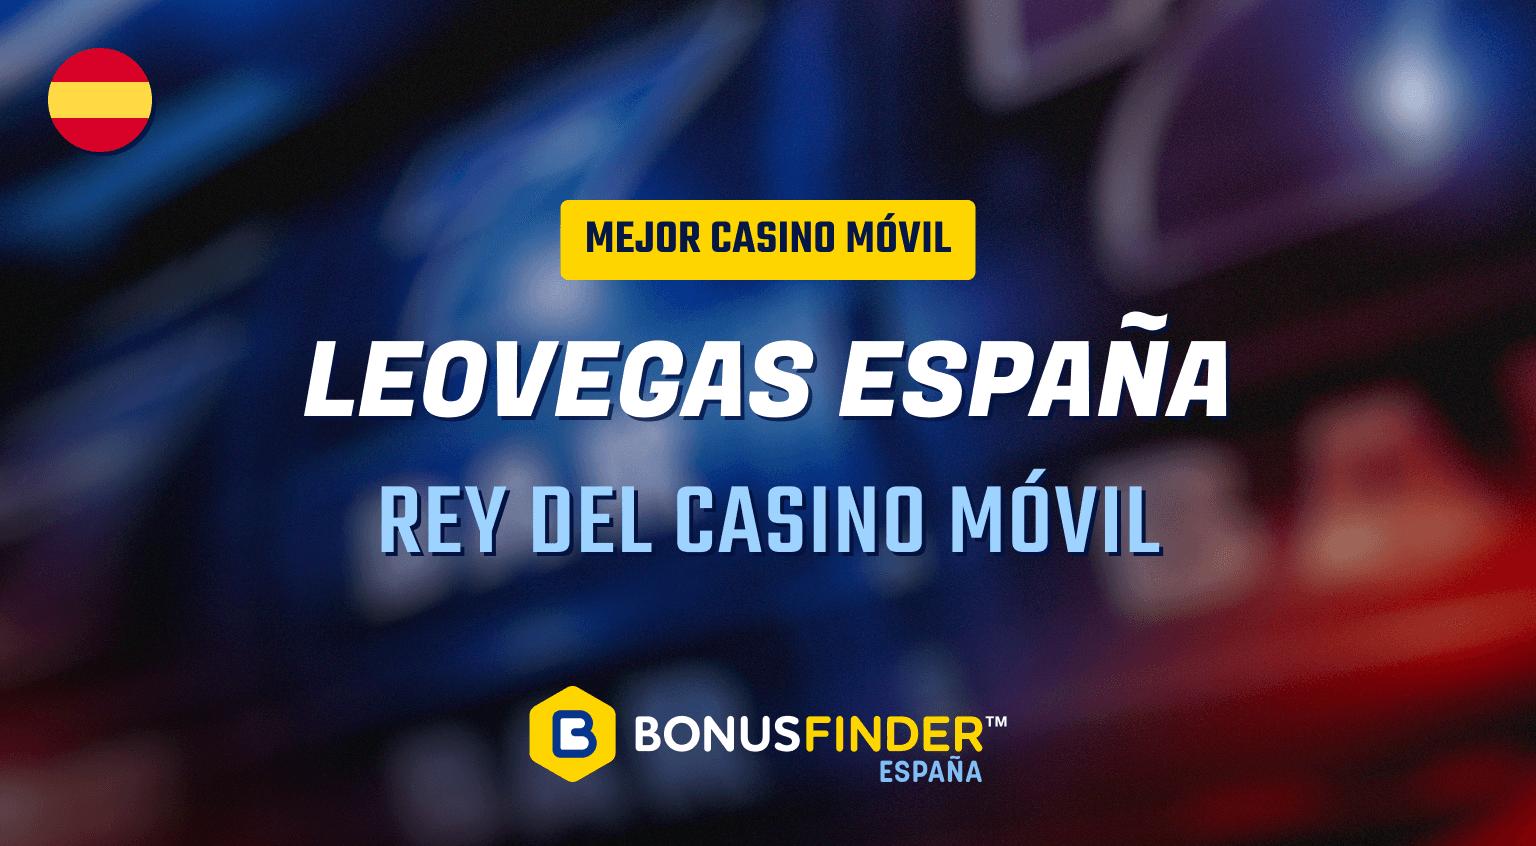 Nuevo casino móvil